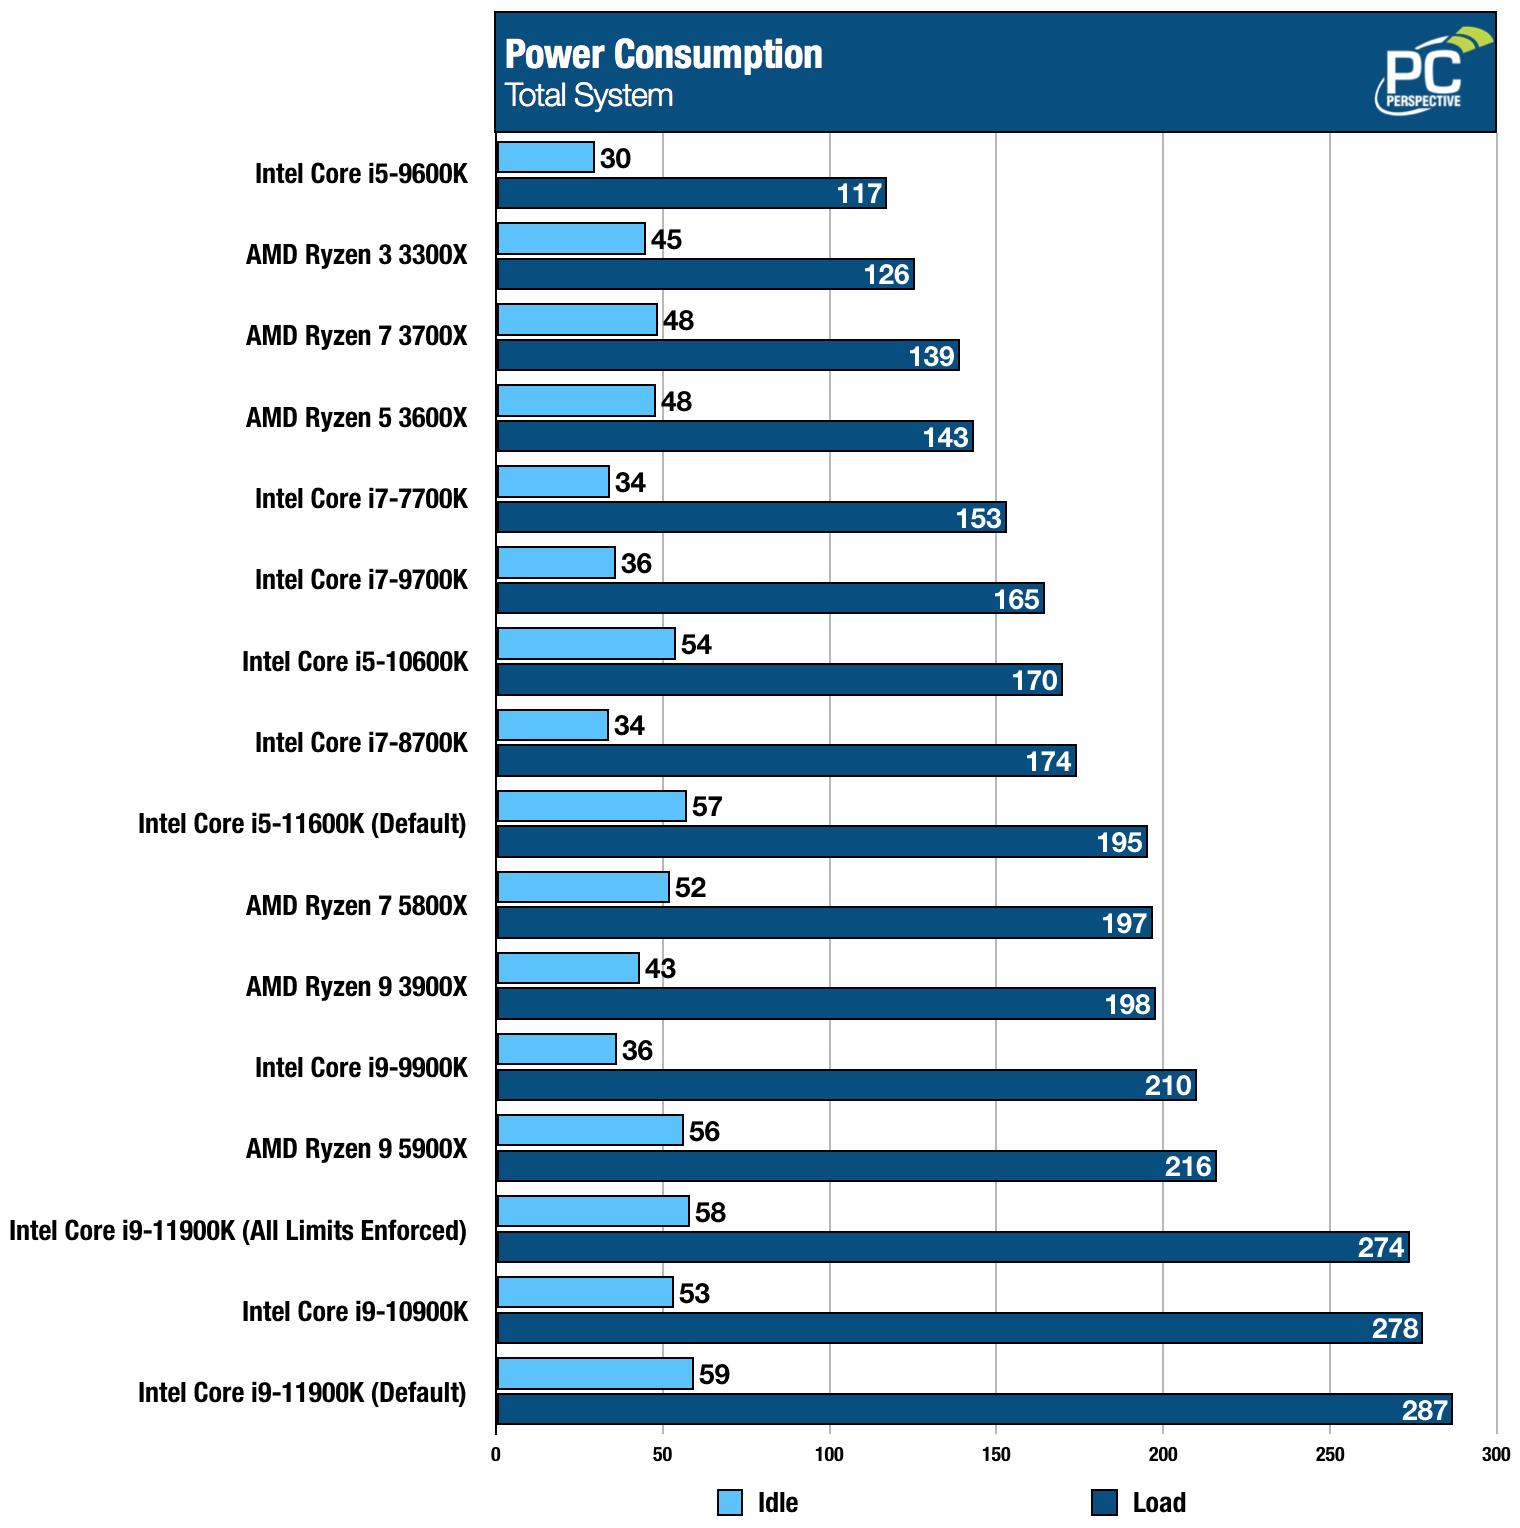 Intel Core i9-11900K i5-11600K Power Draw Chart